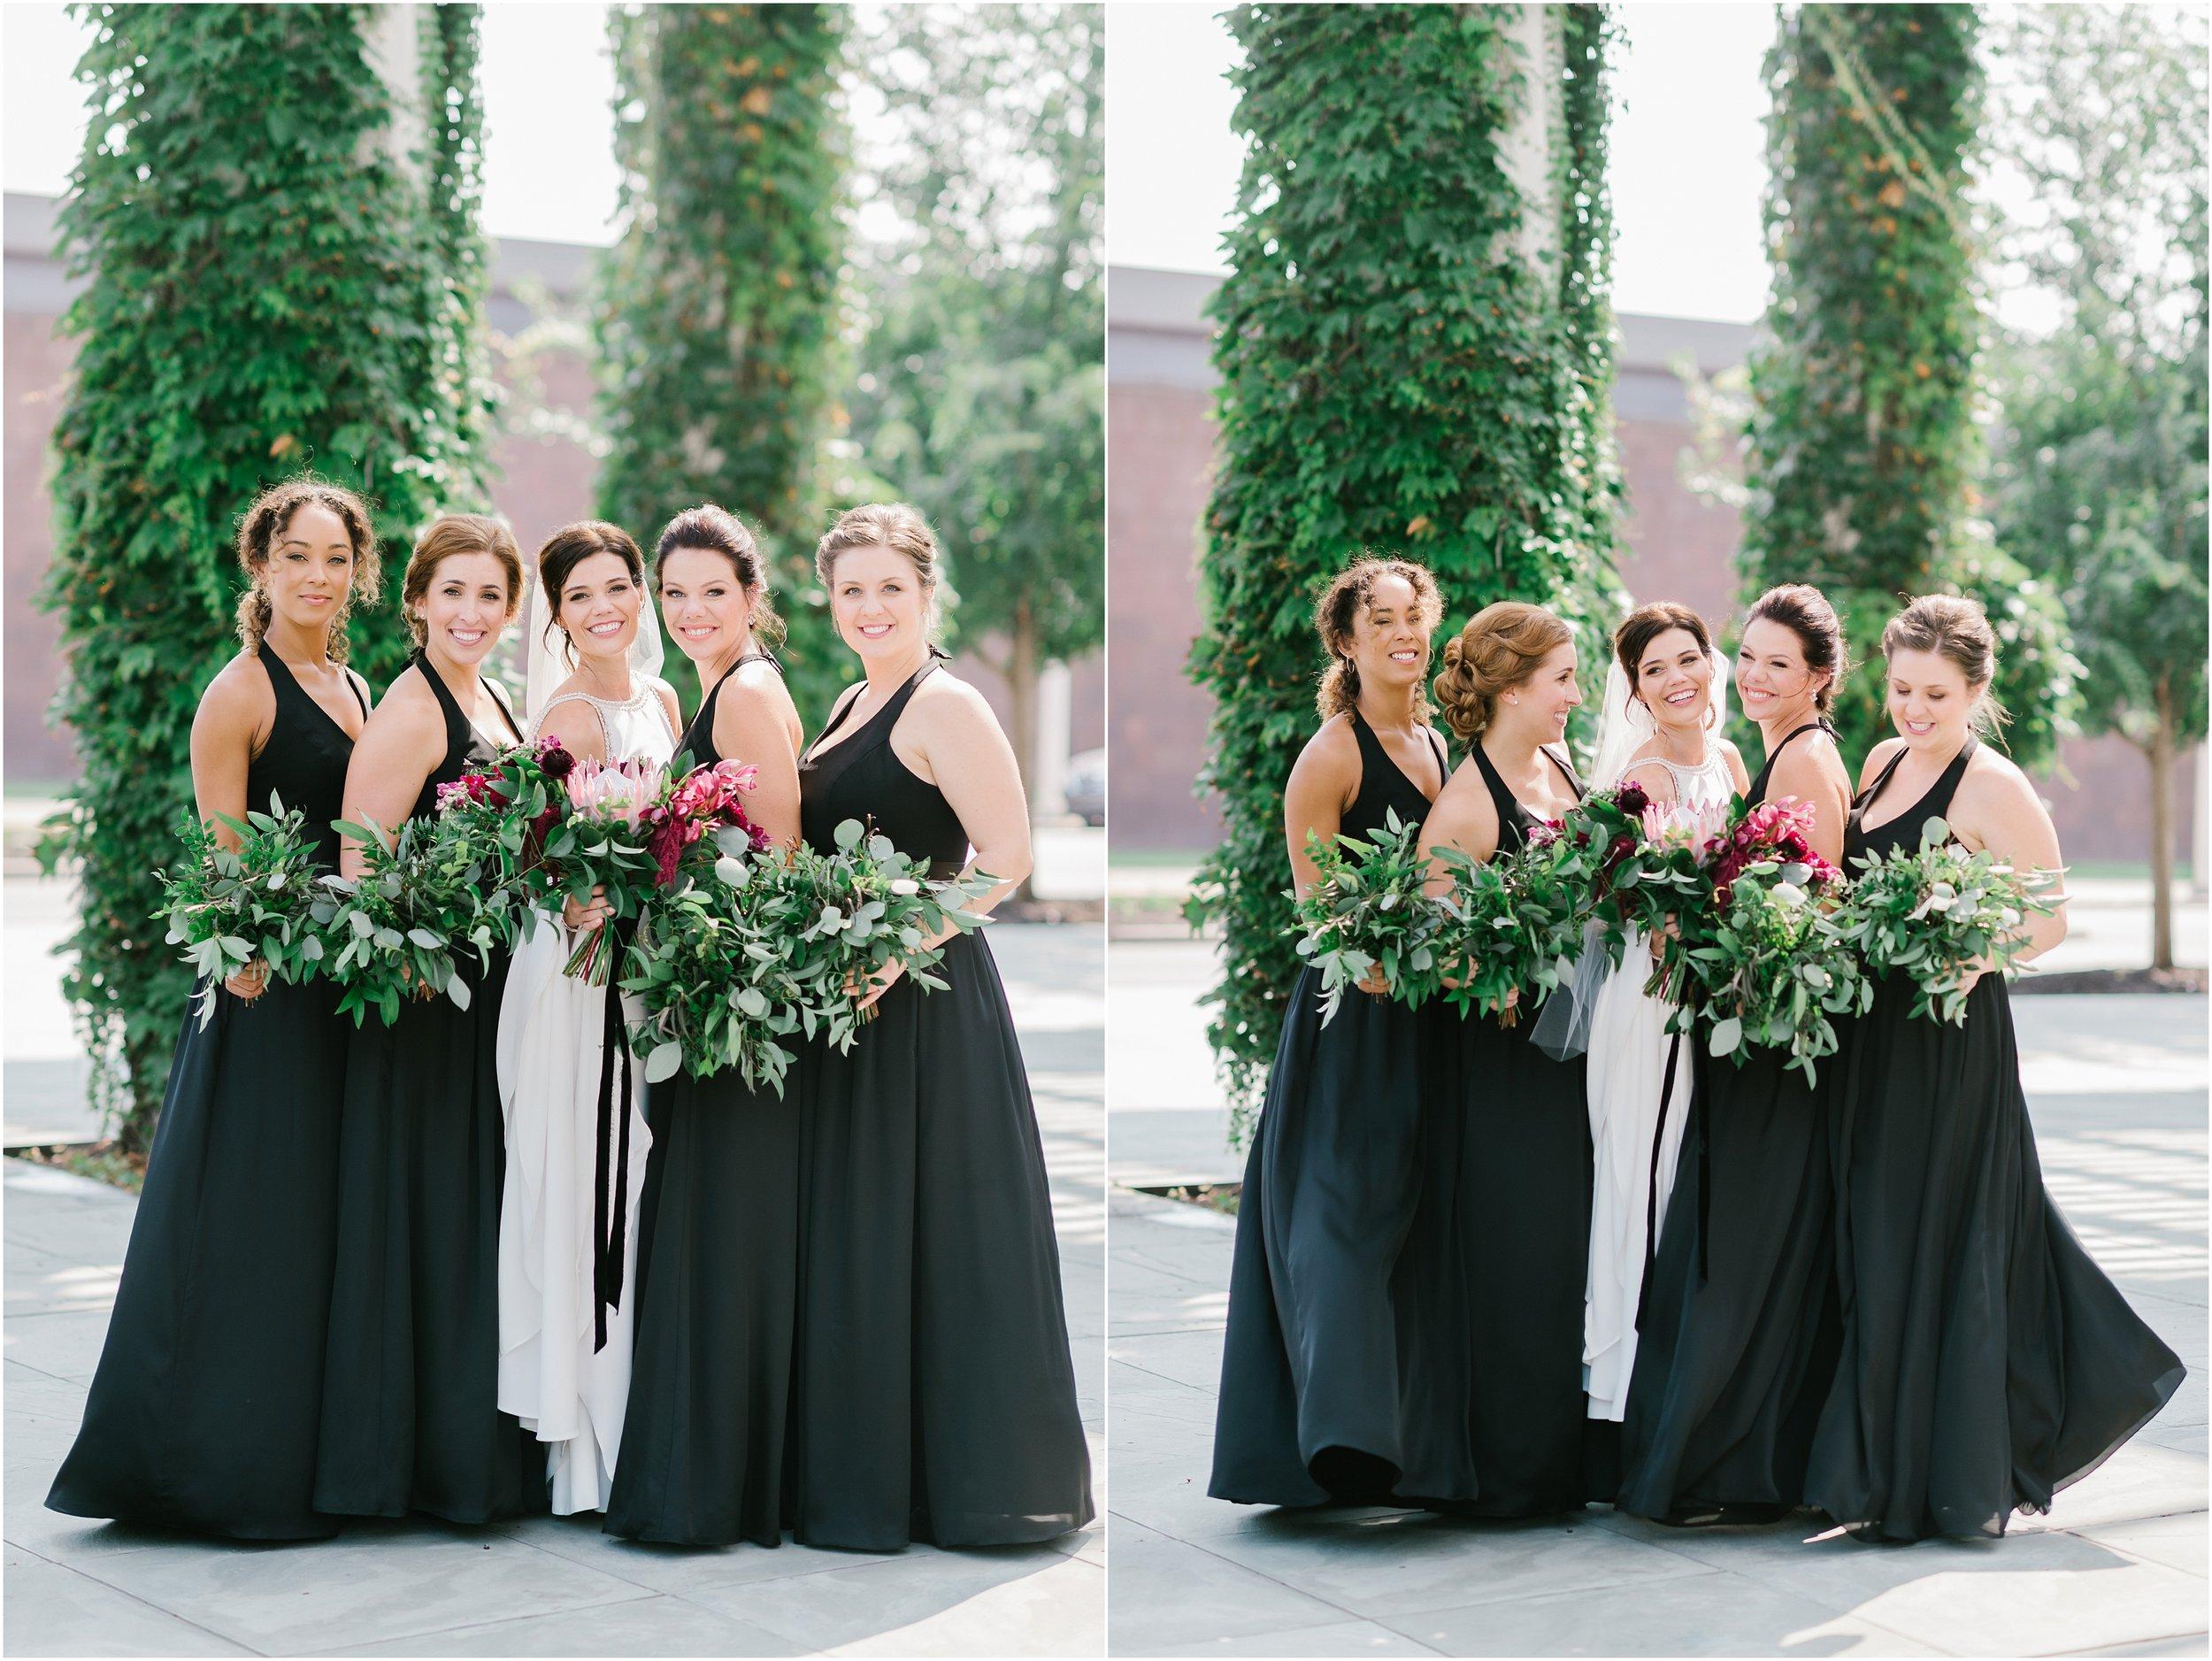 Rebecca_Shehorn_Photography_Indianapolis Wedding Photographer Sycamore at Mallow Run Wedding_9736.jpg